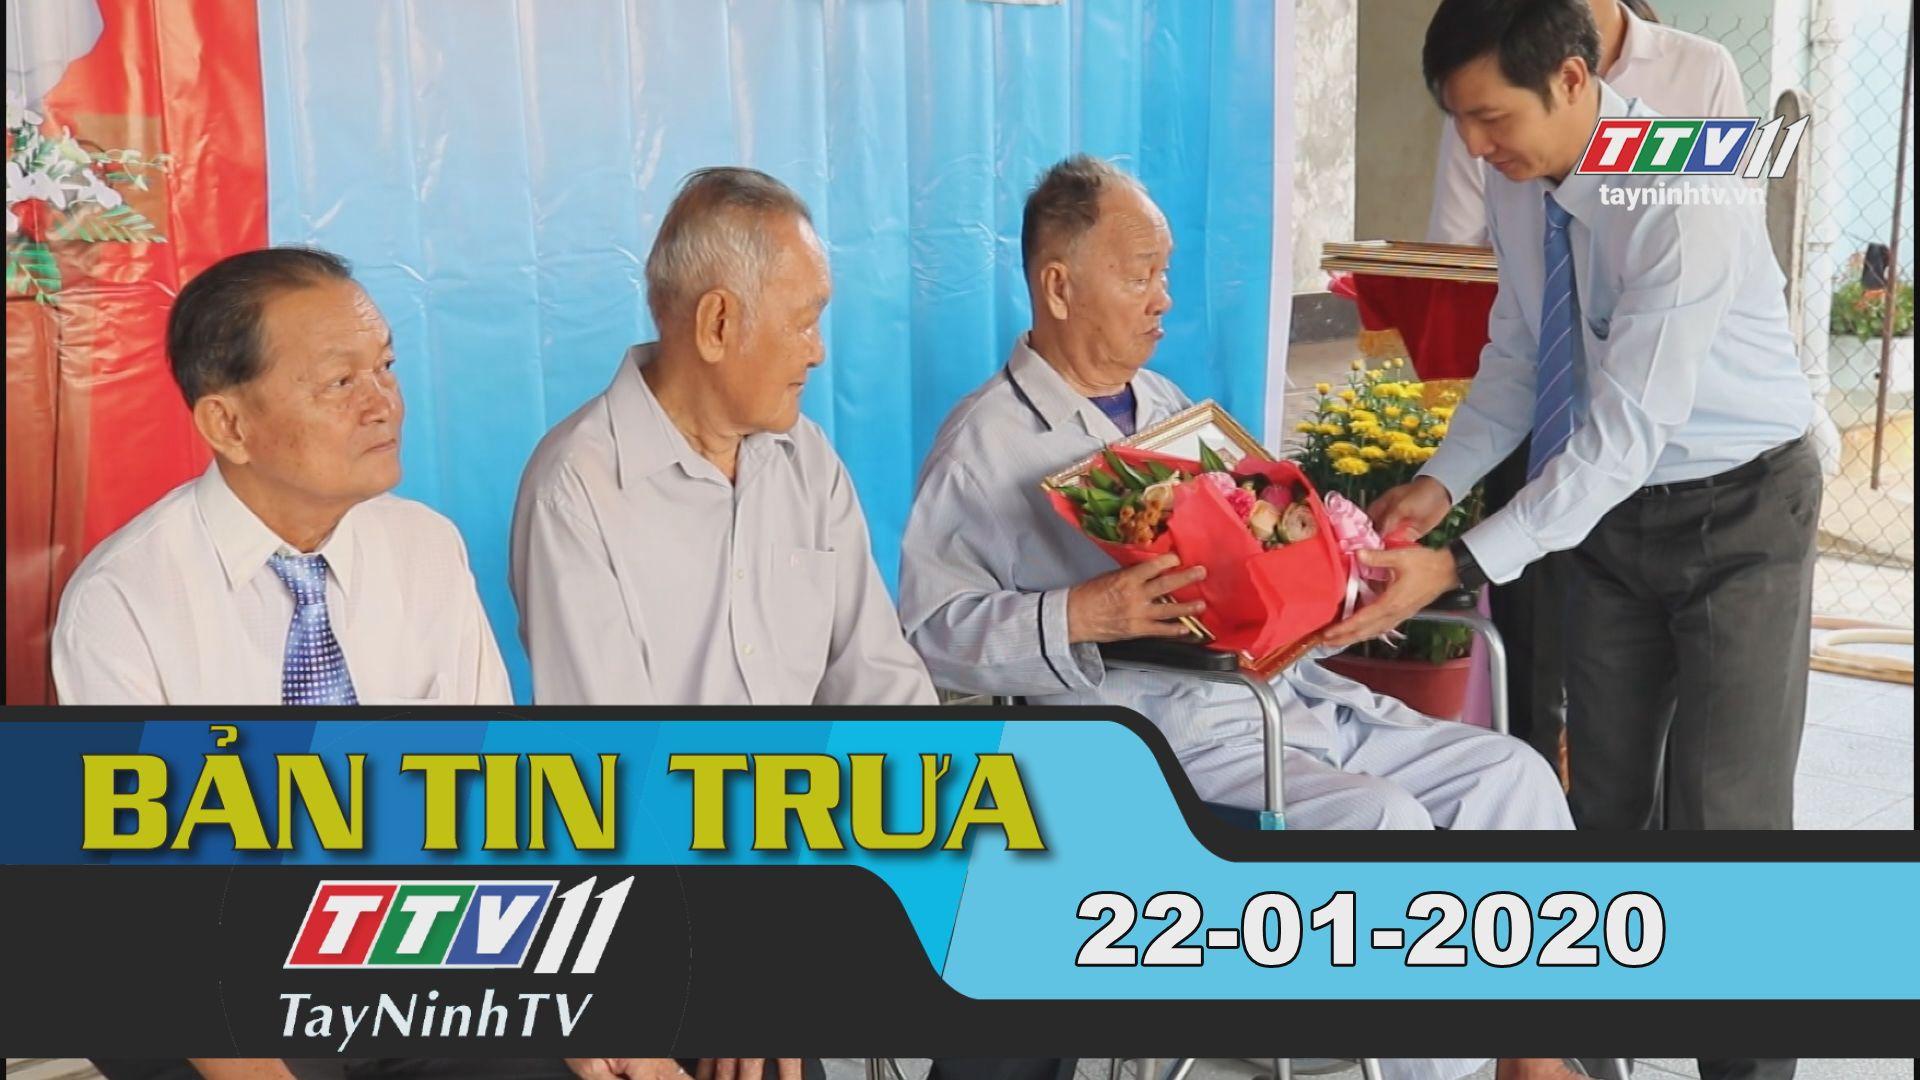 Bản tin trưa 22-01-2020 | Tin tức hôm nay | TayNinhTV